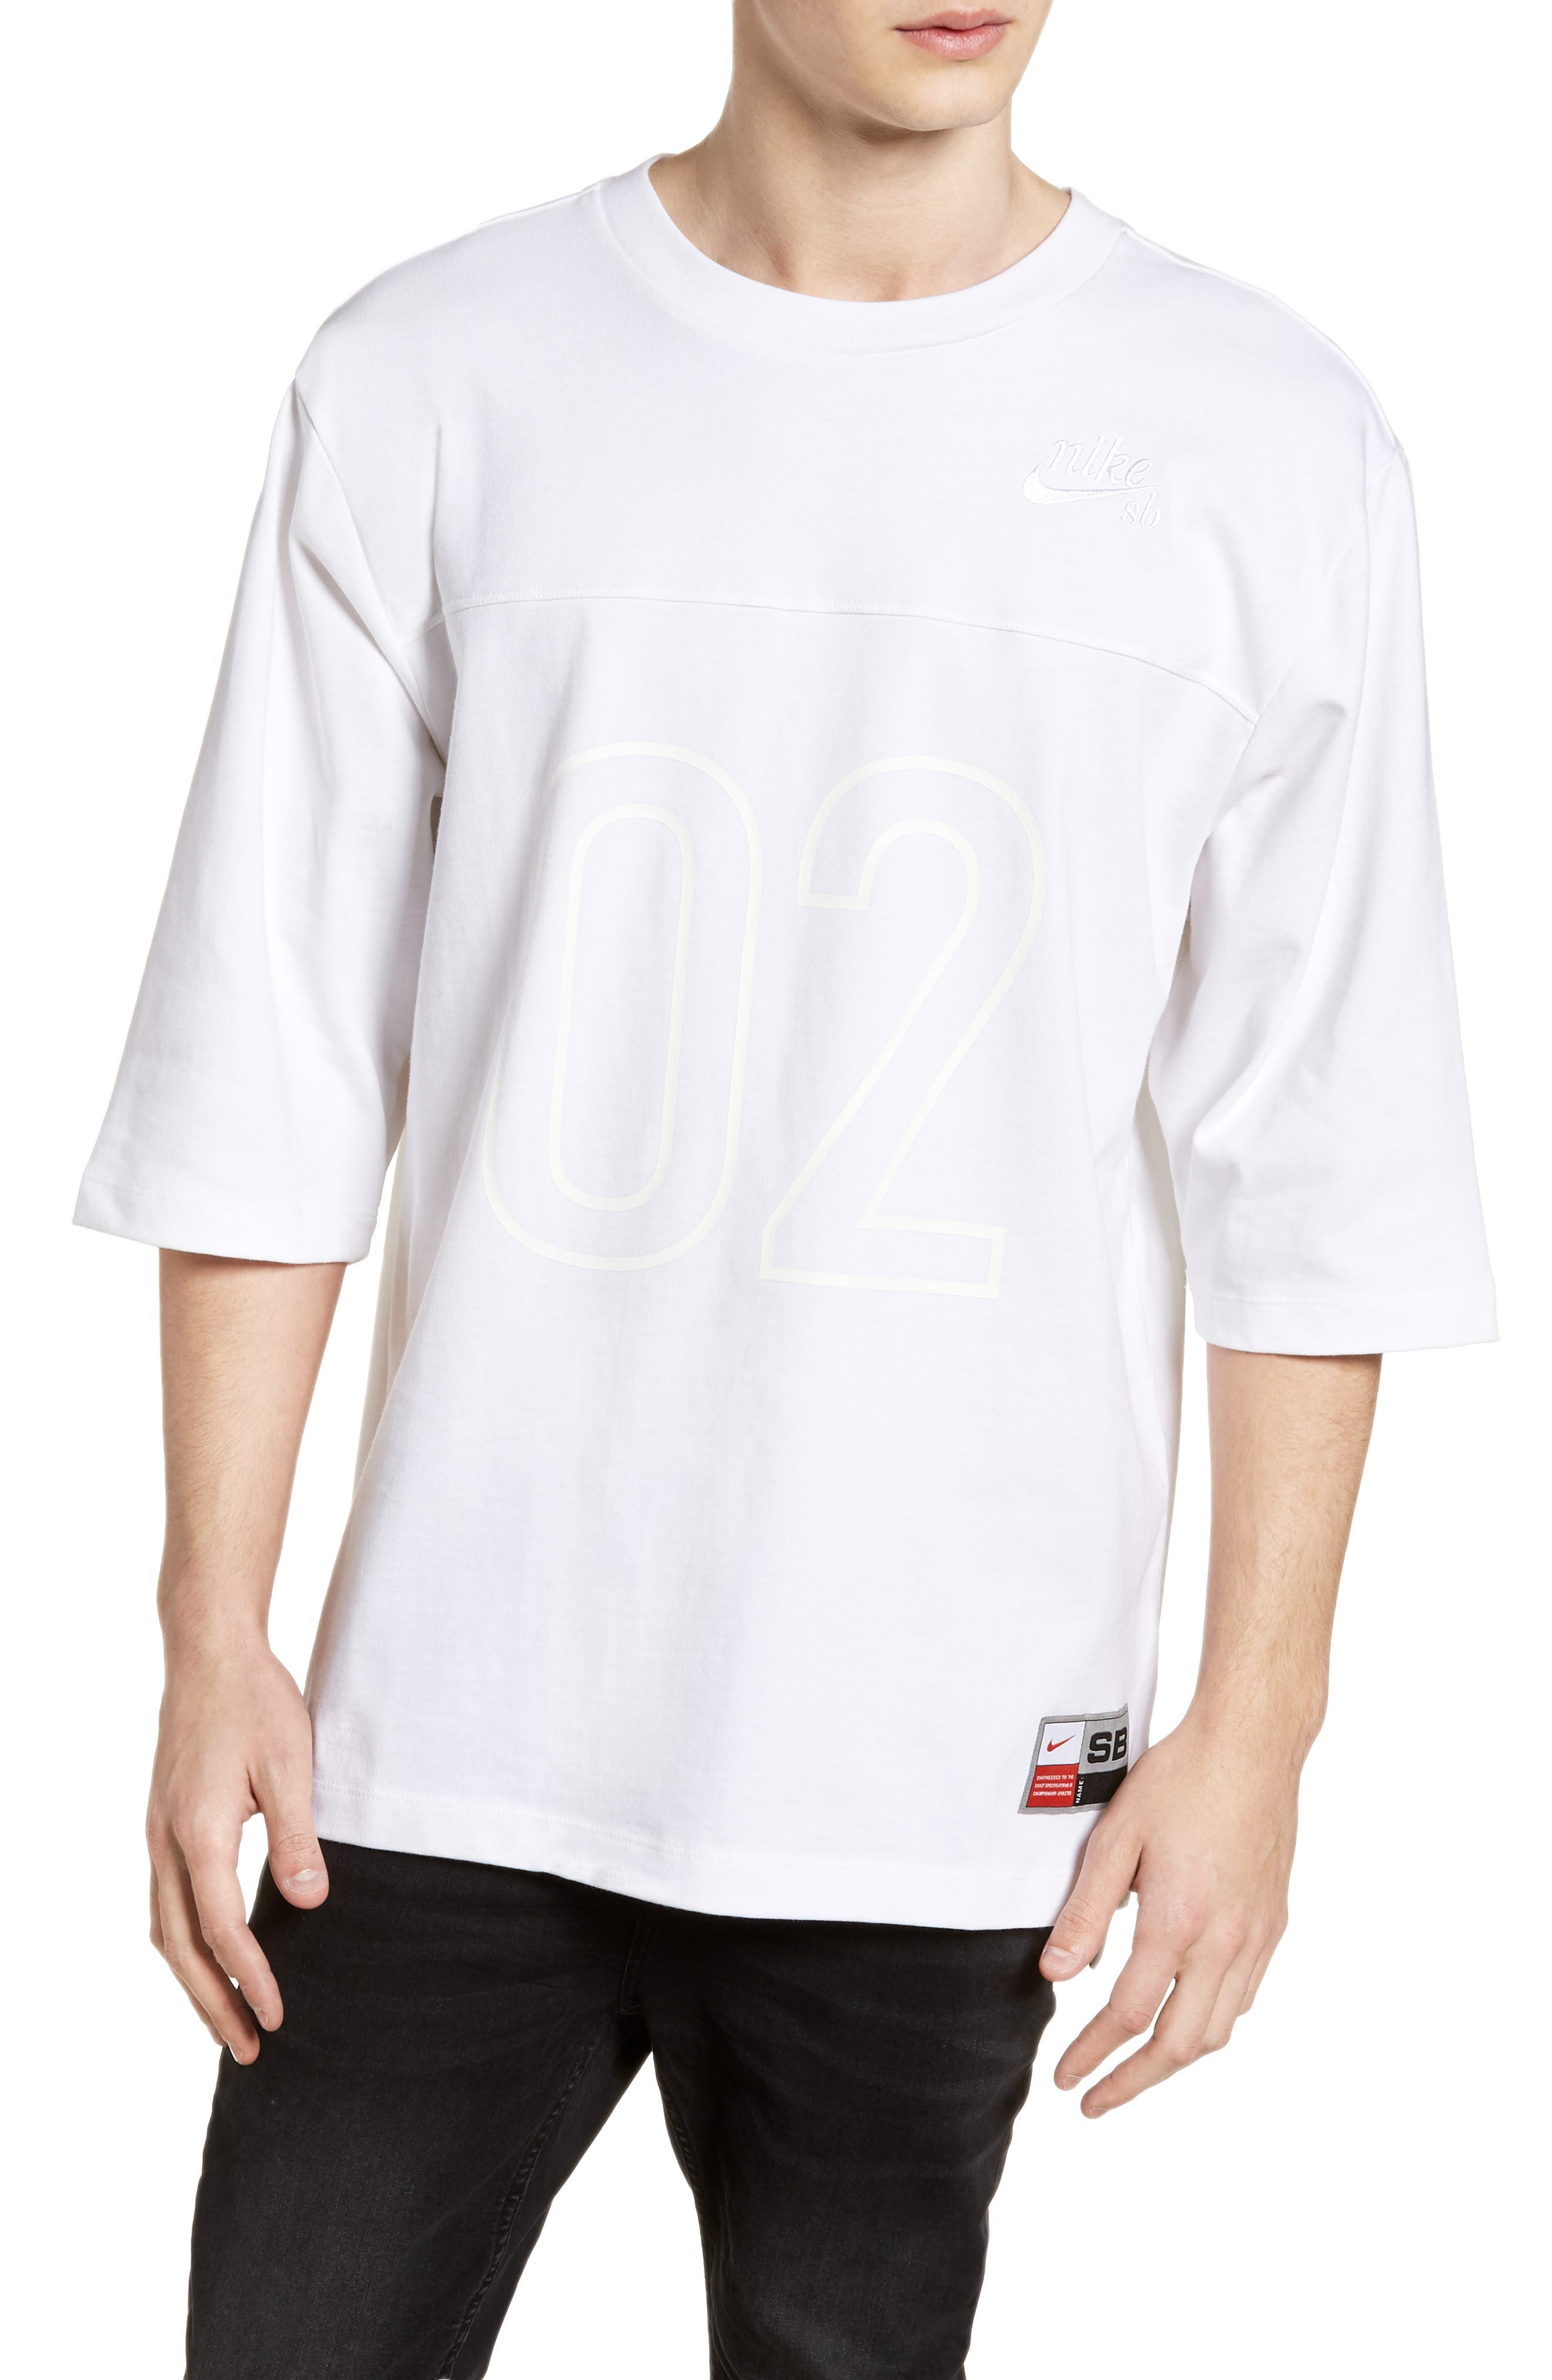 Nike Sb Dri-Fit Basketball Daydream T-Shirt, White